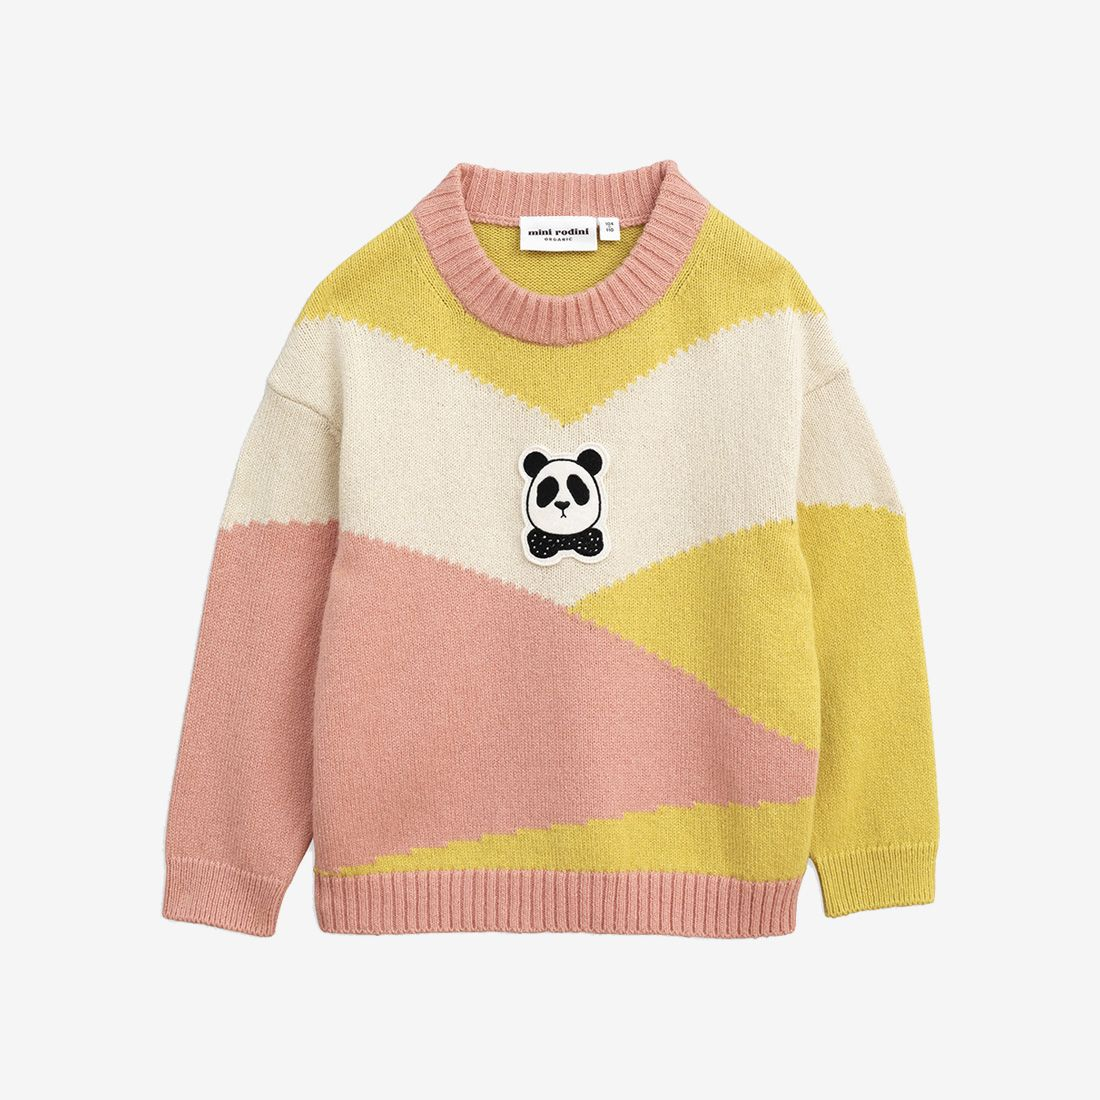 Cozy Panda Knitted Wool Sweater